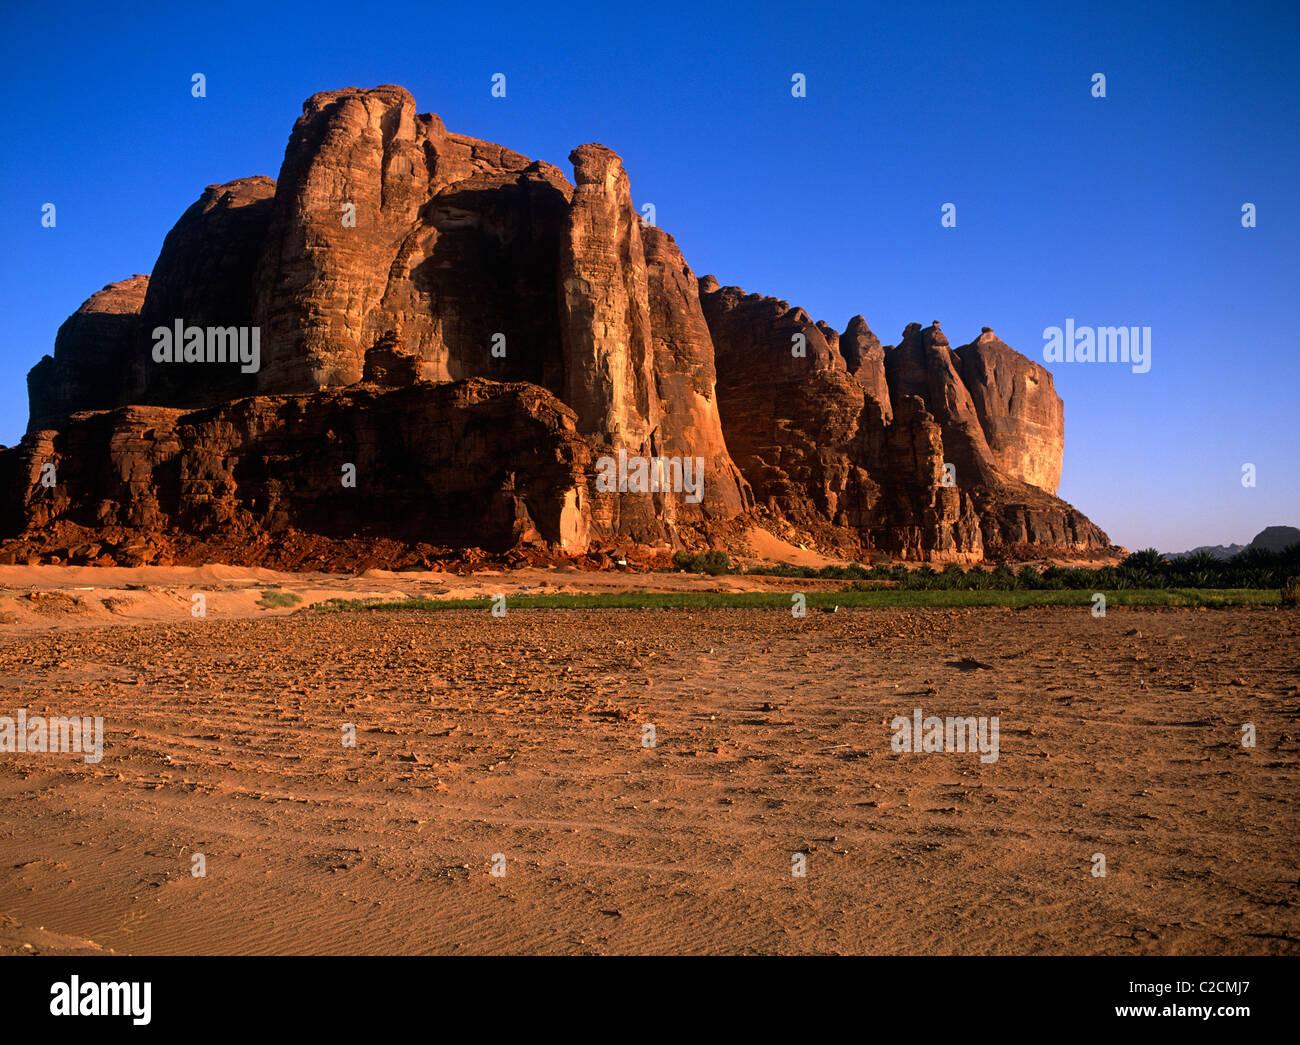 Al-Ula Oasis  Saudi Arabia - Stock Image